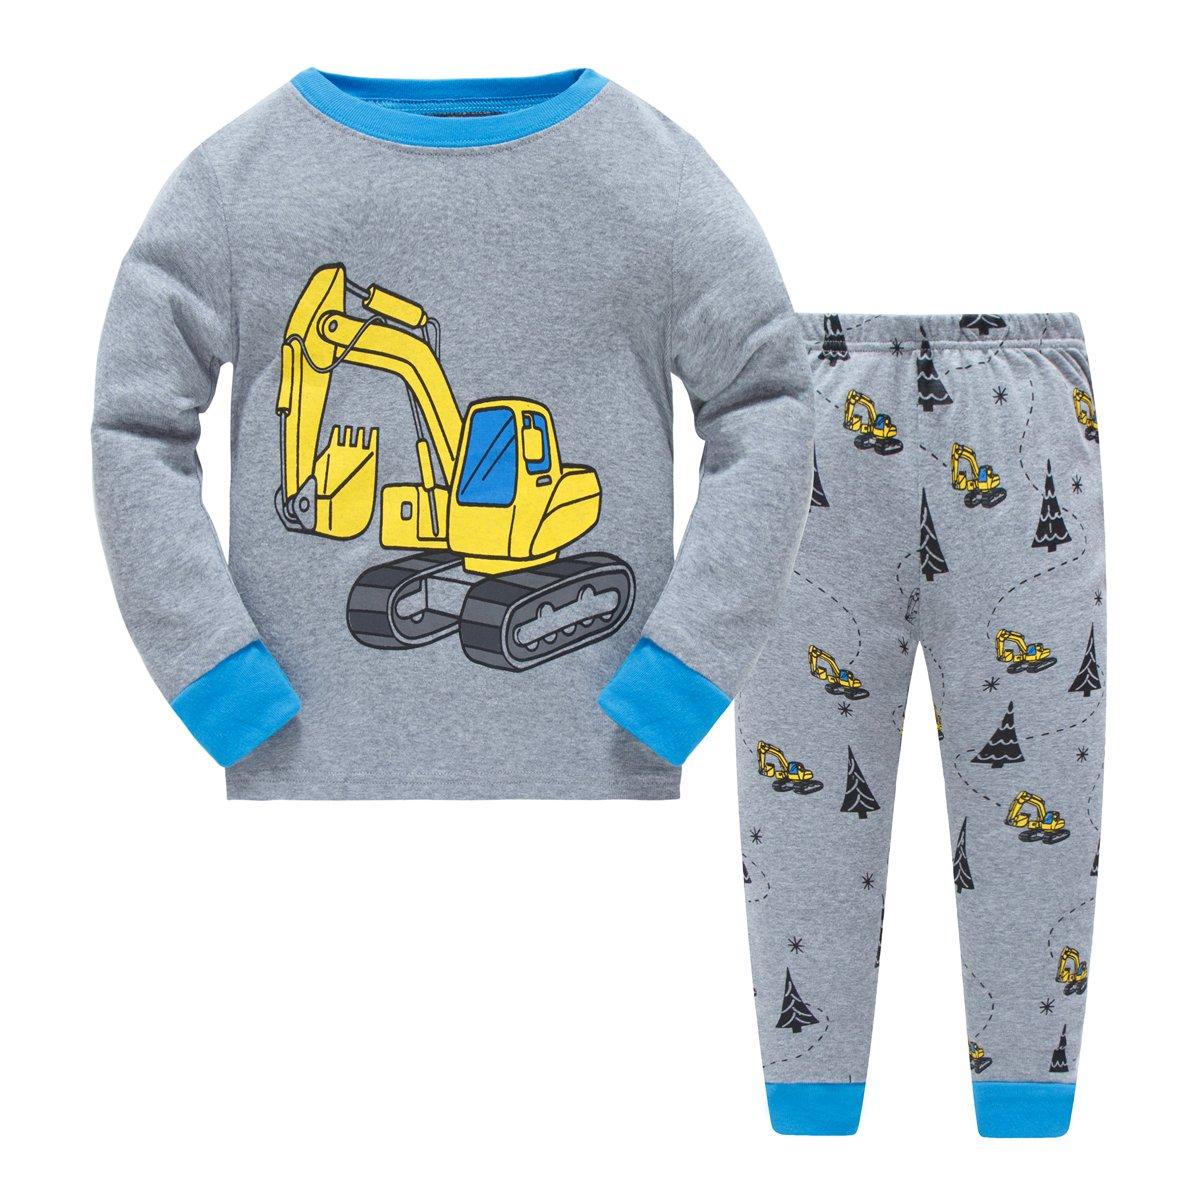 Boys Pajamas Excavator Childrens Pjs Kids Rib Long Sleeves Cotton Clothes Set Czofnjesi